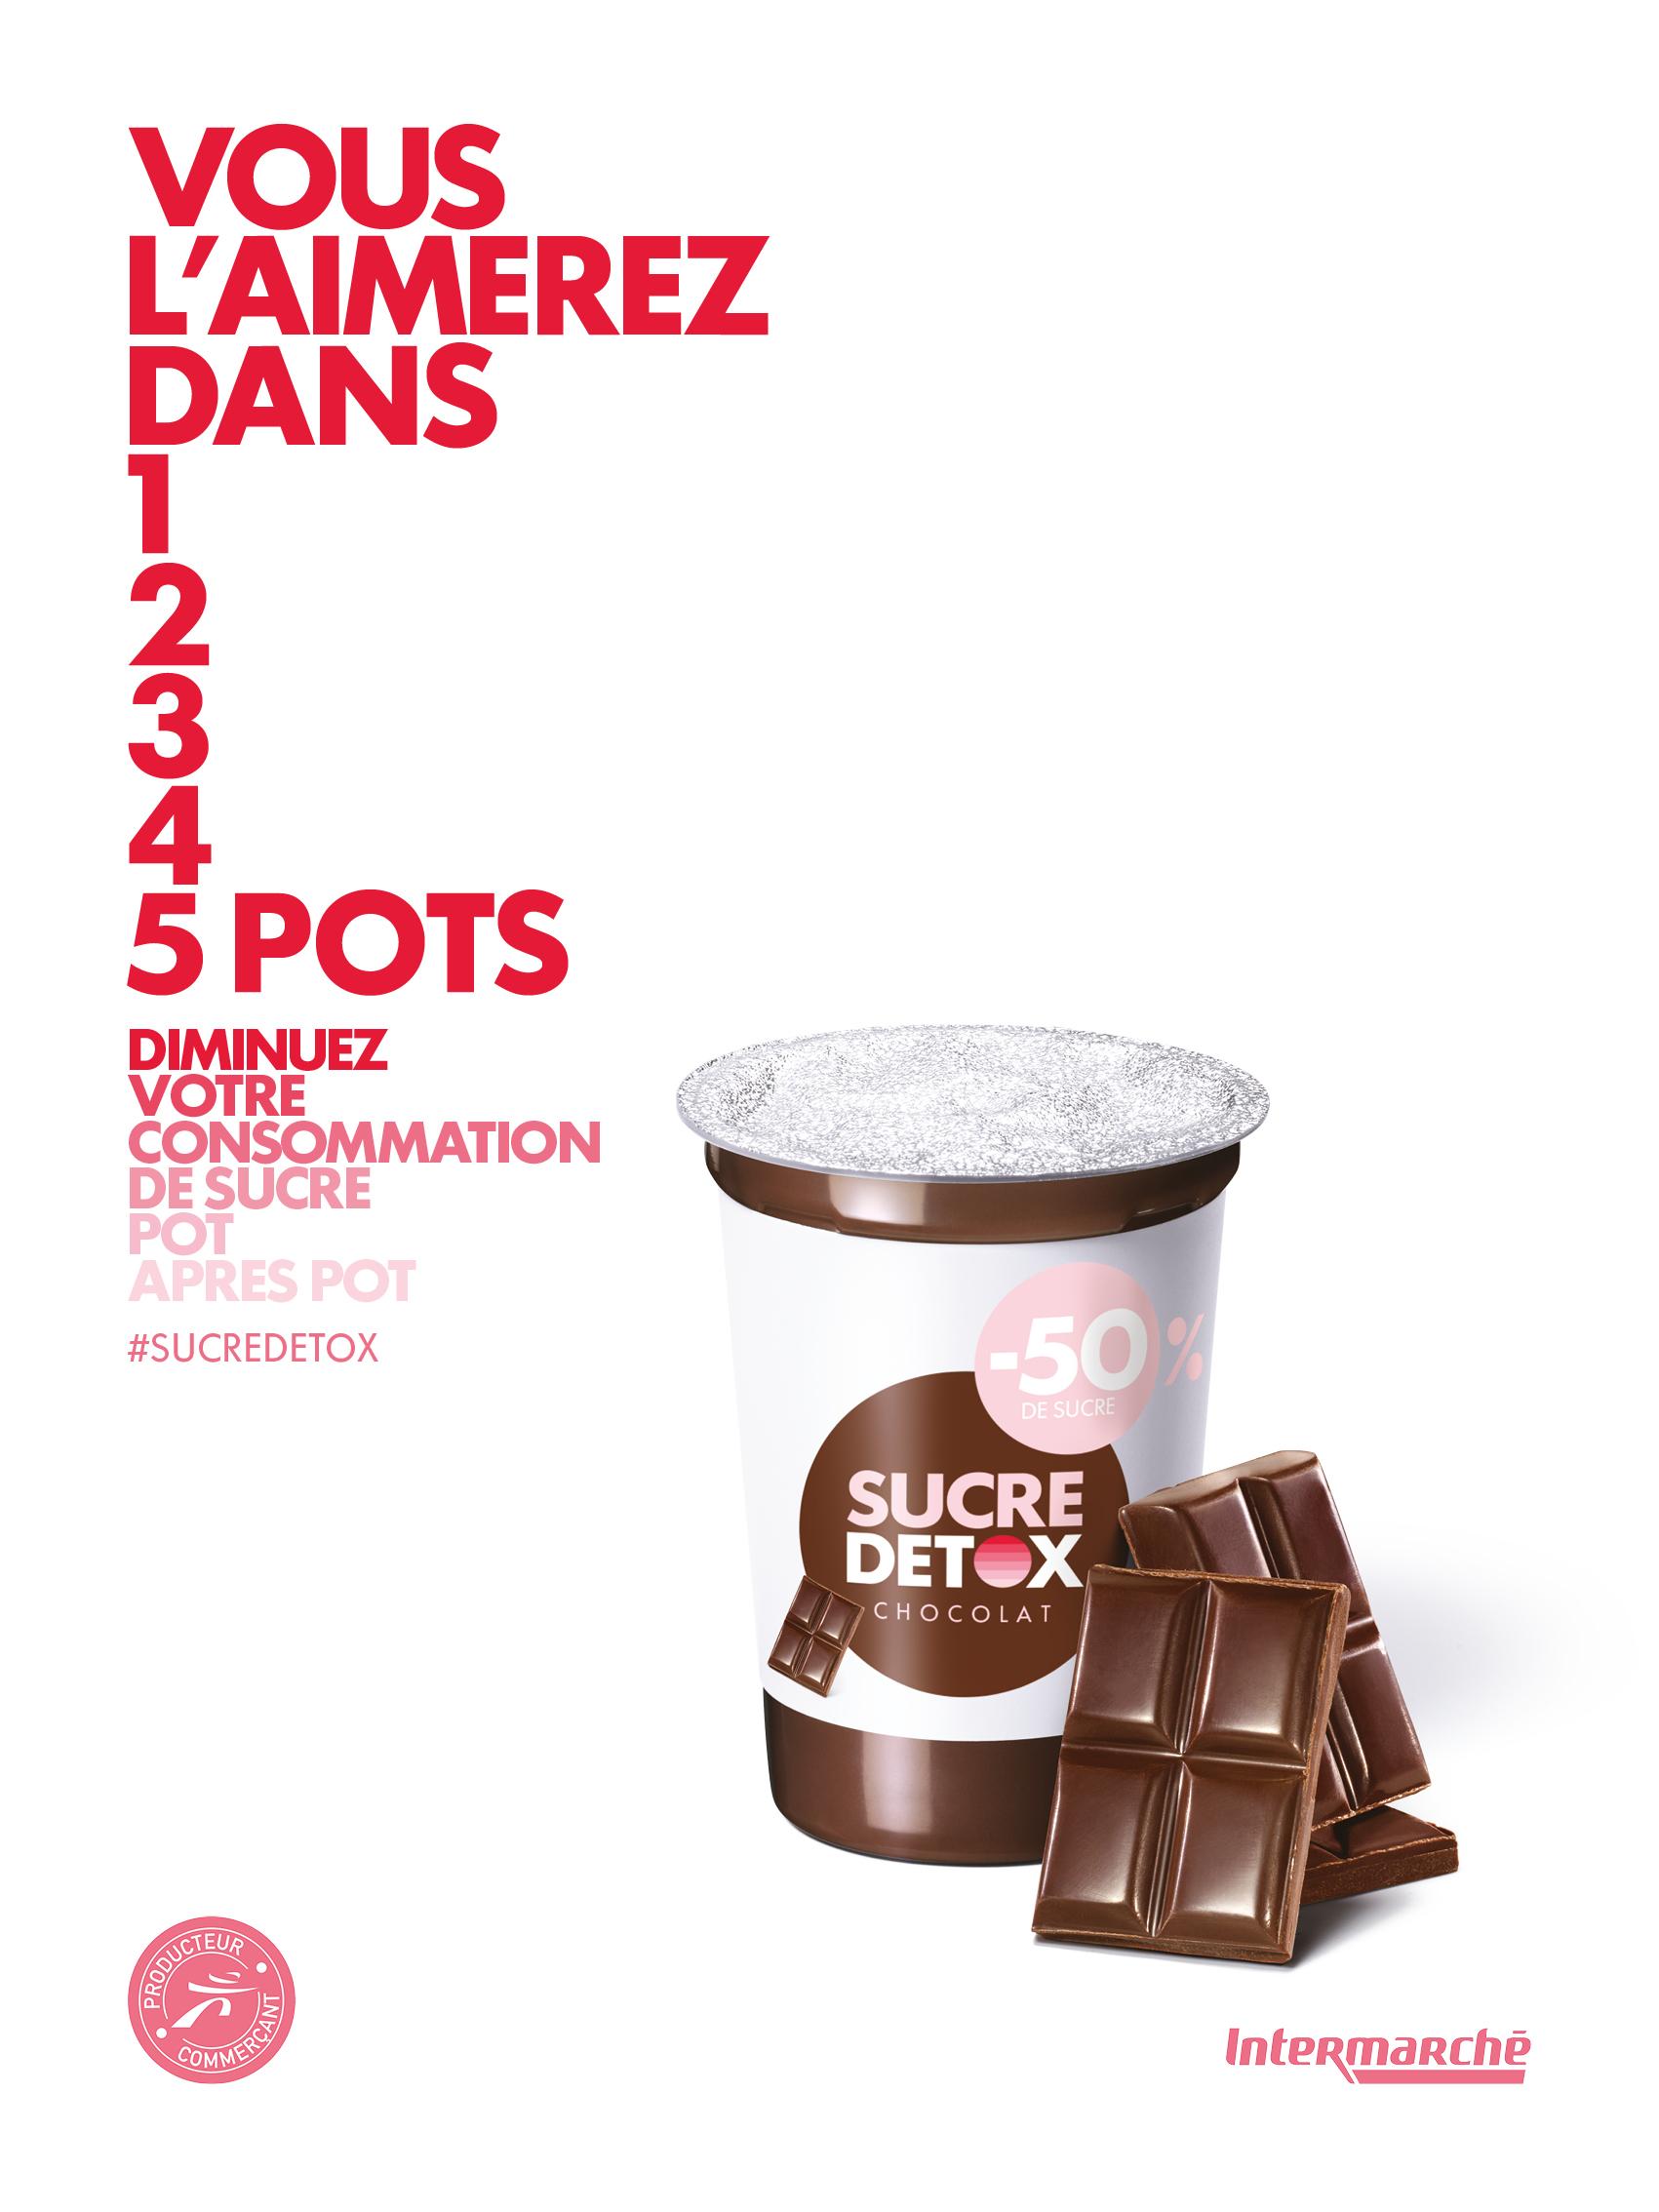 intermarche-sucre-detox-creme-dessert-pourcentage-sucre-semaine-agence-marcel-3